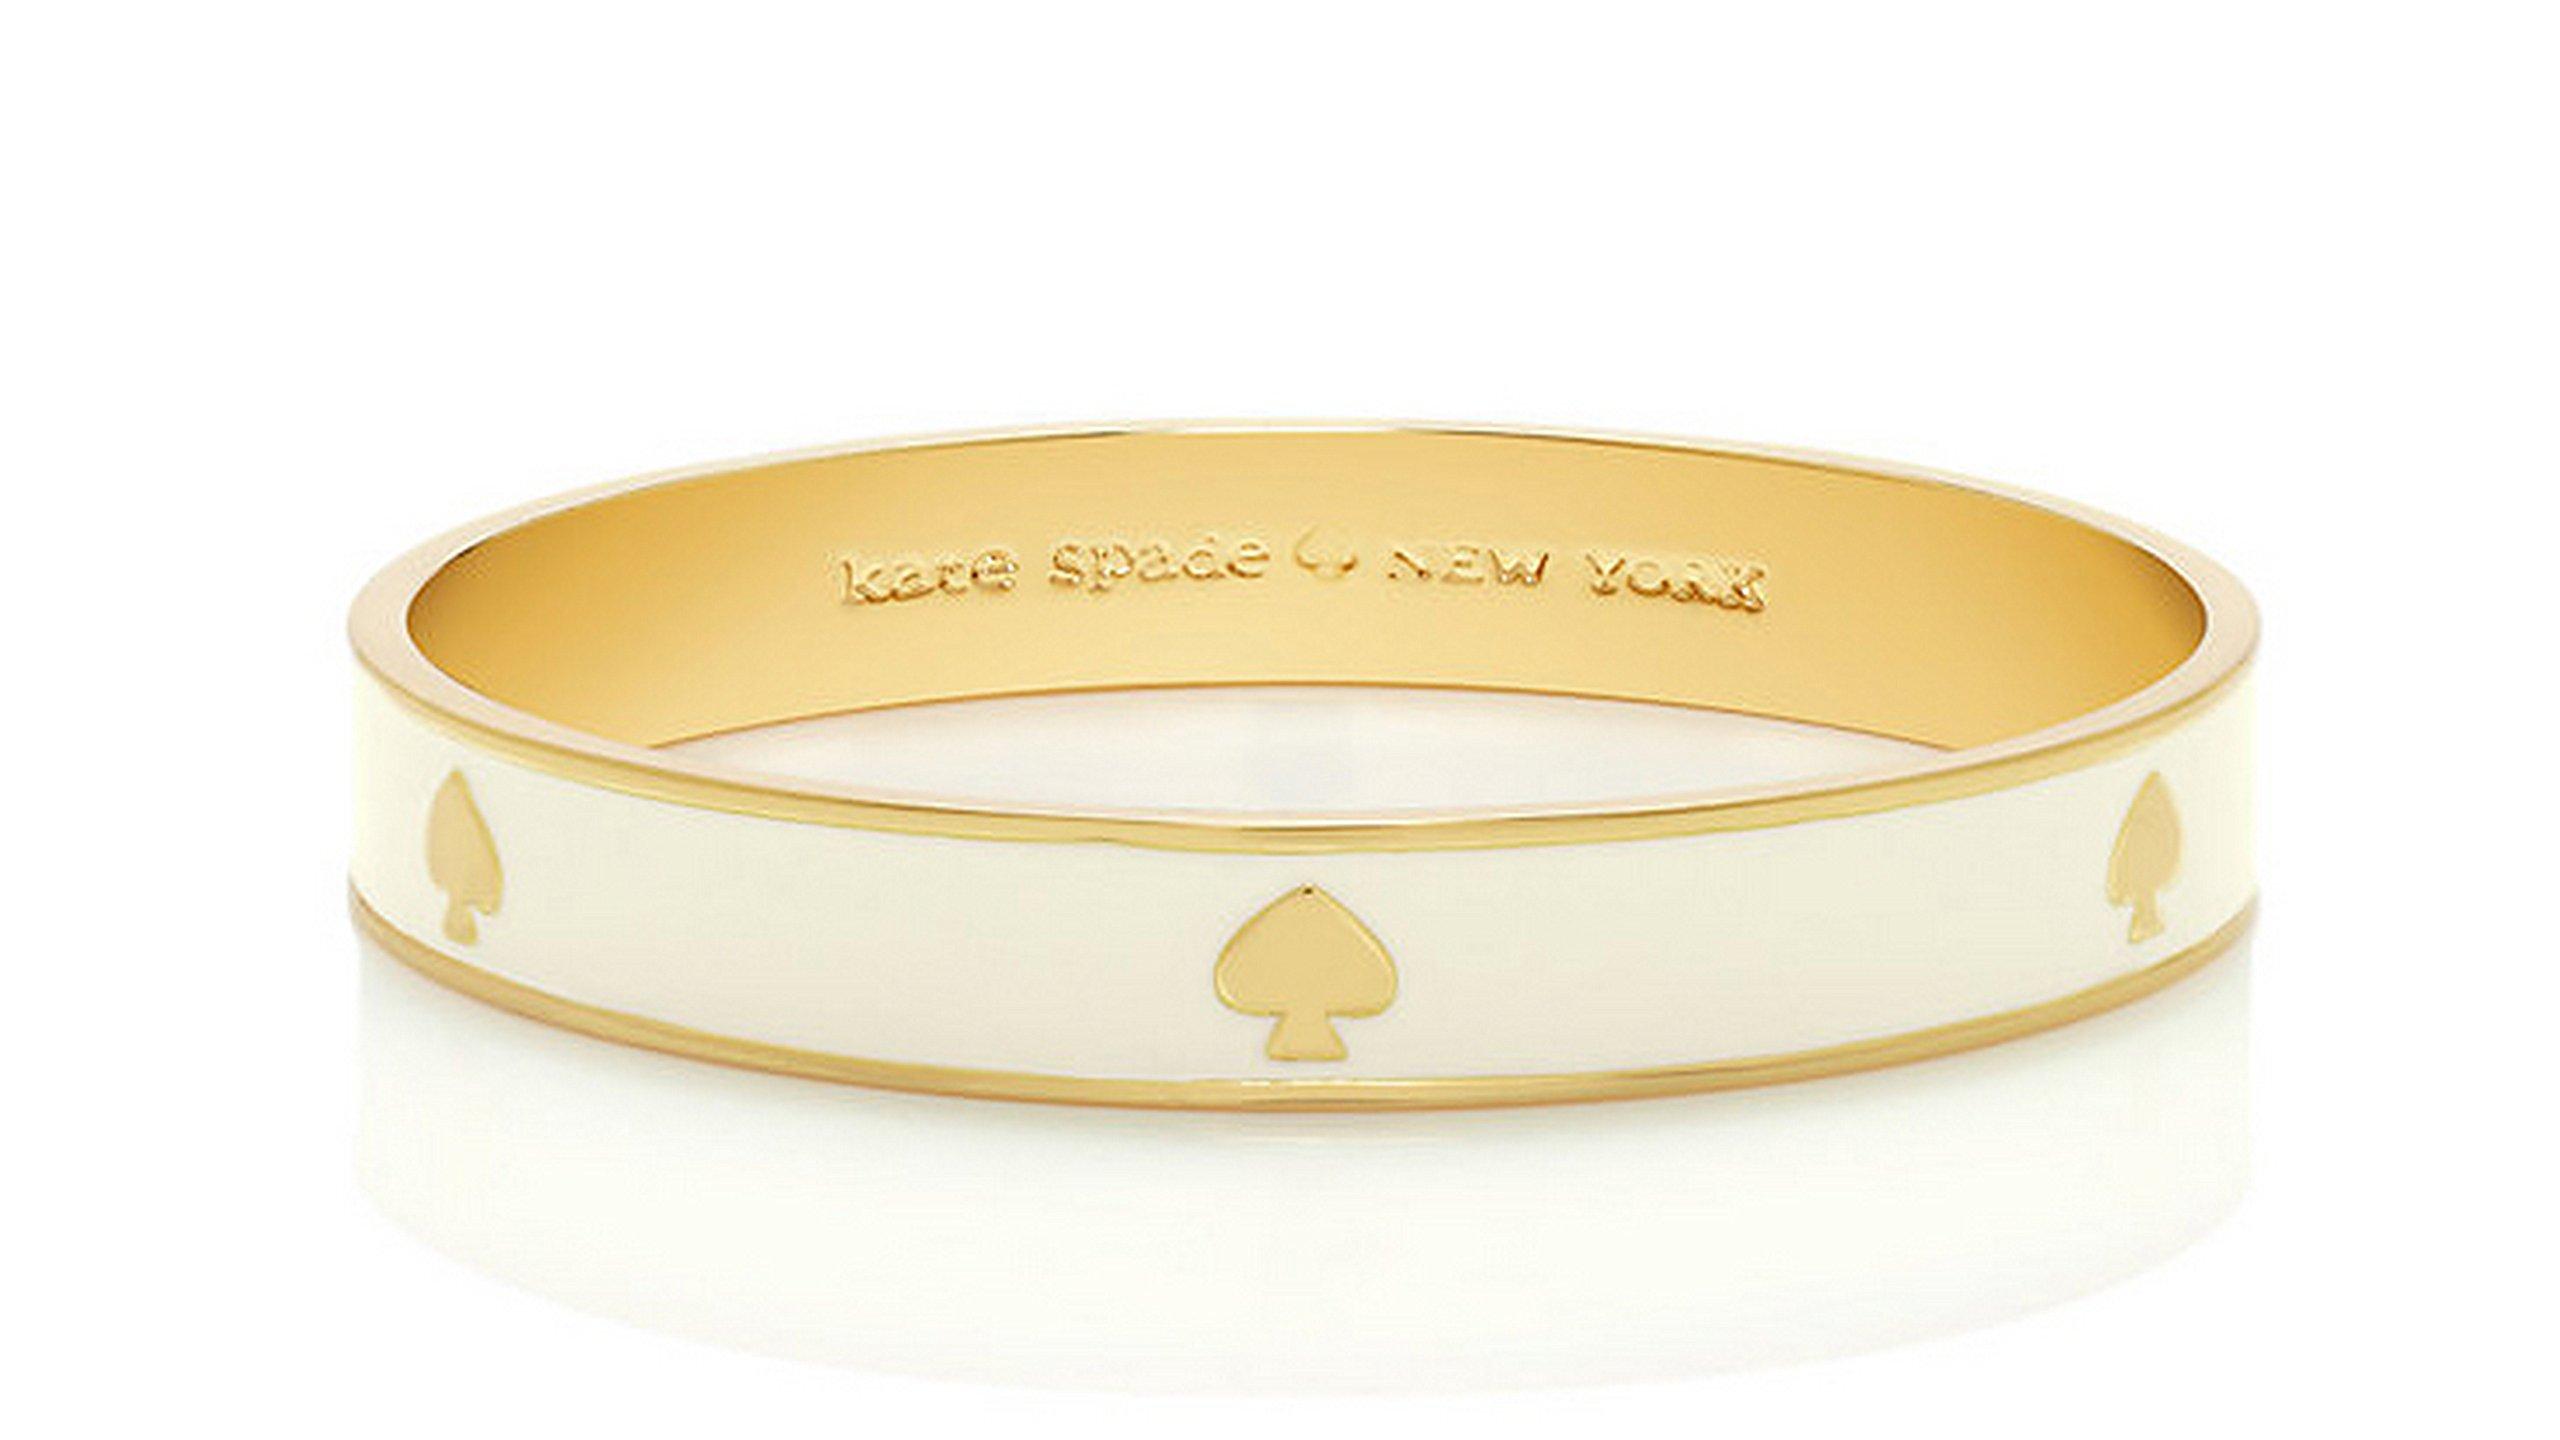 Kate Spade New York Spade Bangle Bracelet, Cream